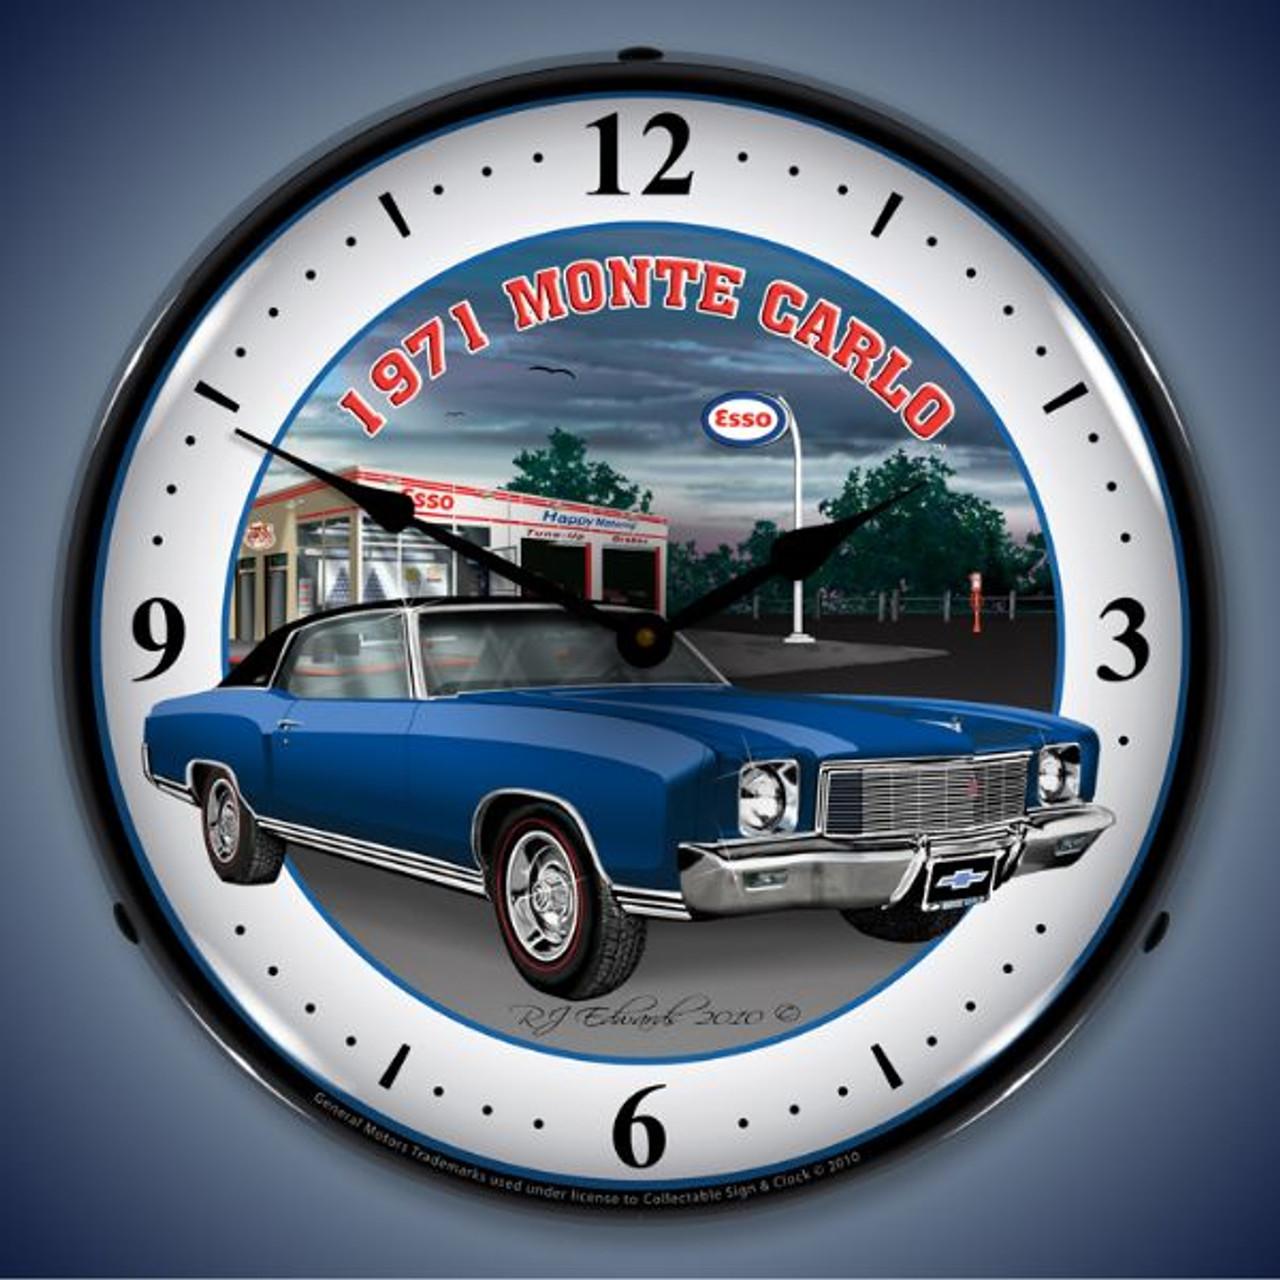 Retro  1971 Monte Carlo Lighted Wall Clock 14 x 14 Inches